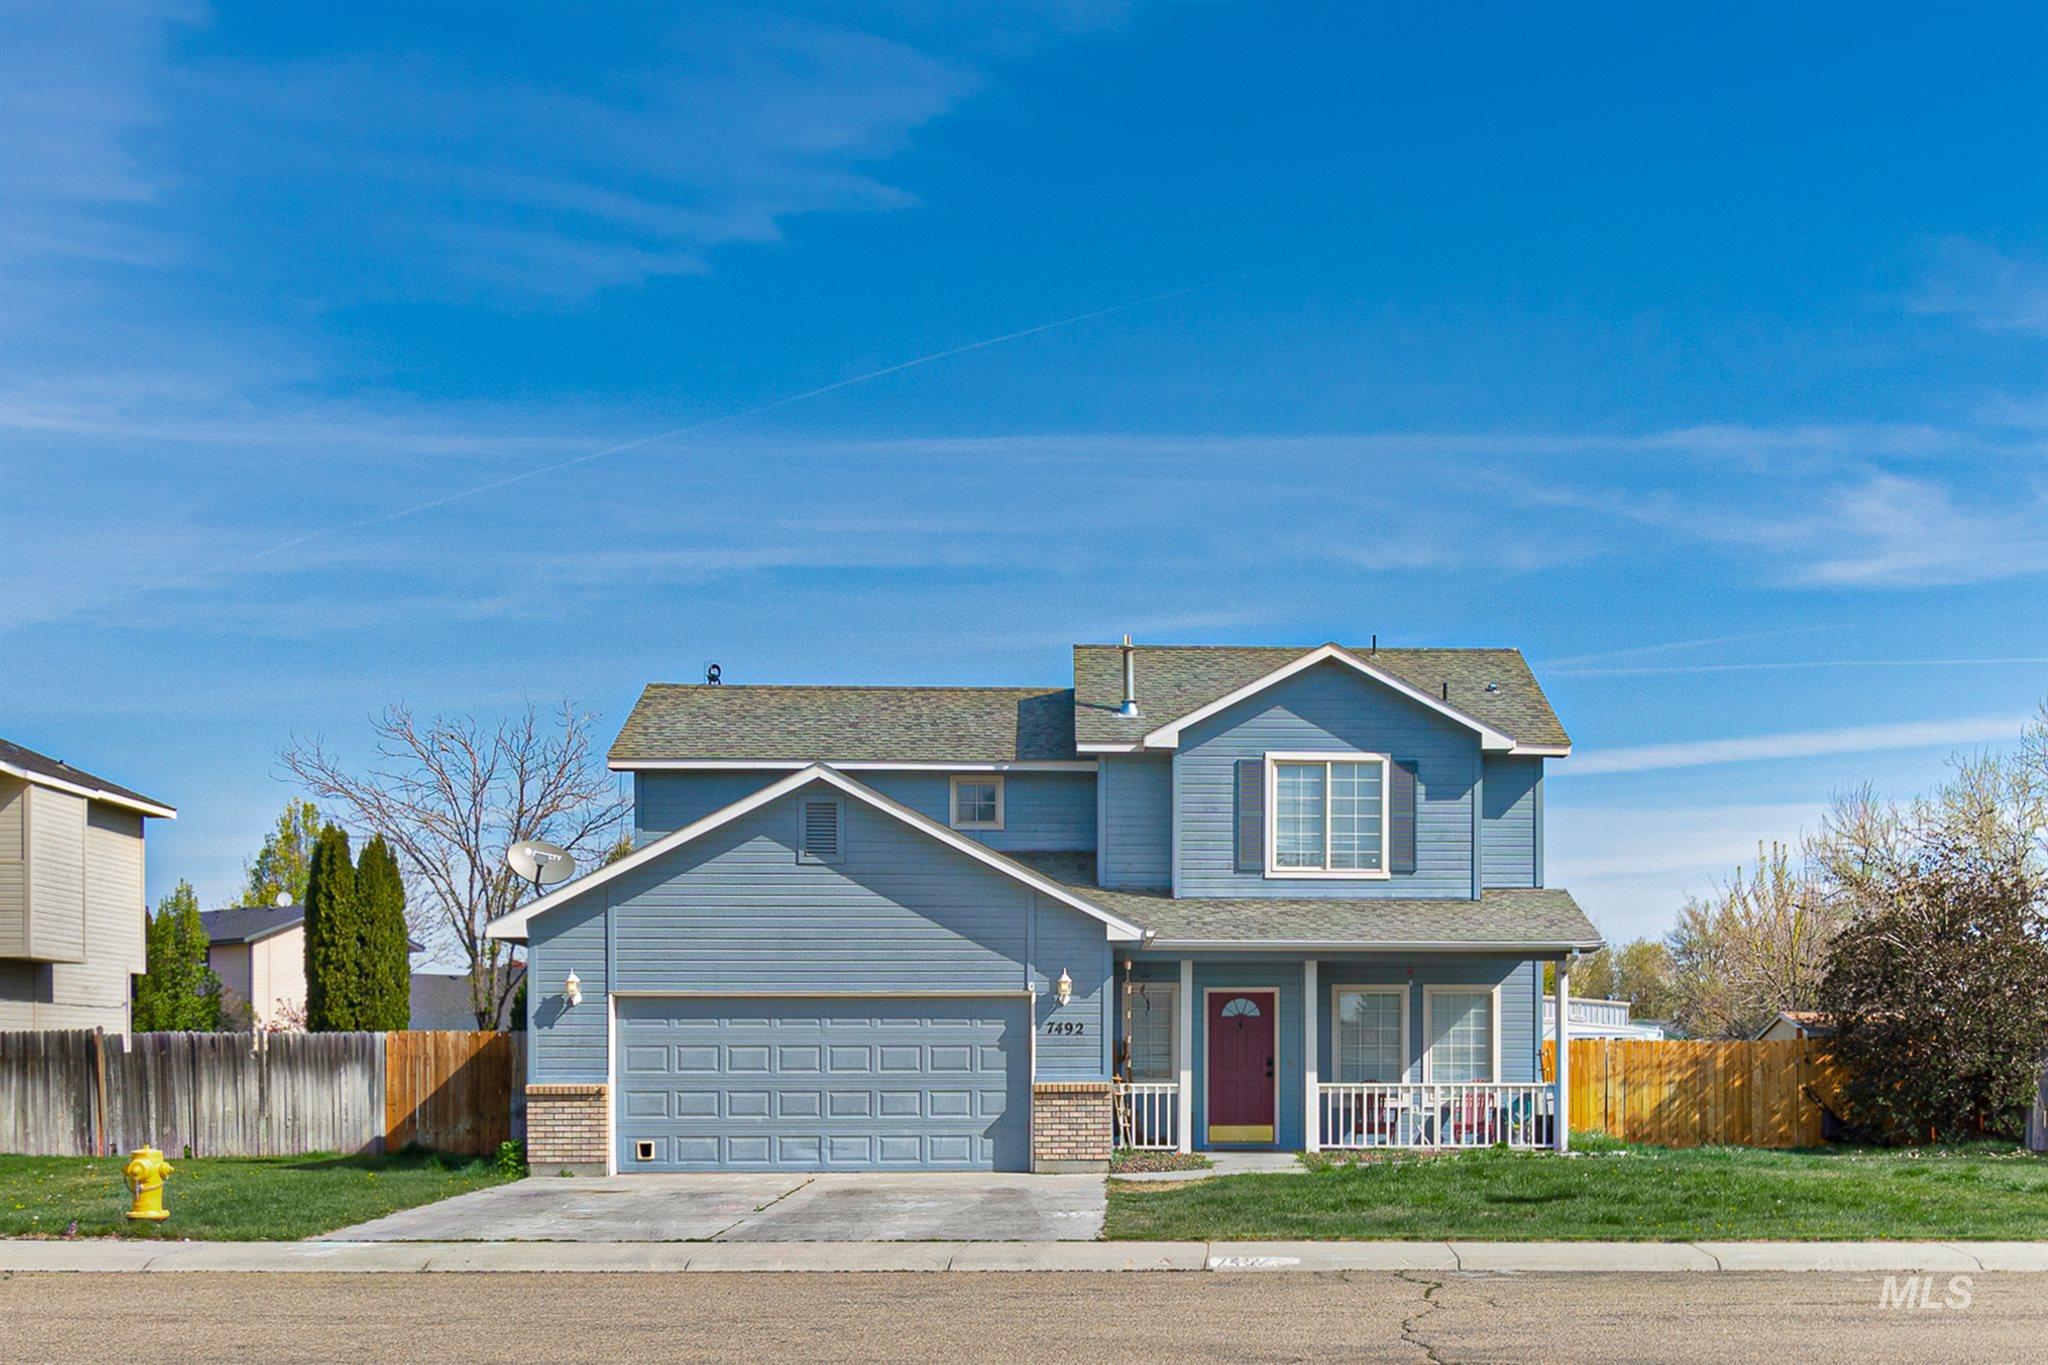 7492 E Edgebrook Dr Property Photo - Nampa, ID real estate listing